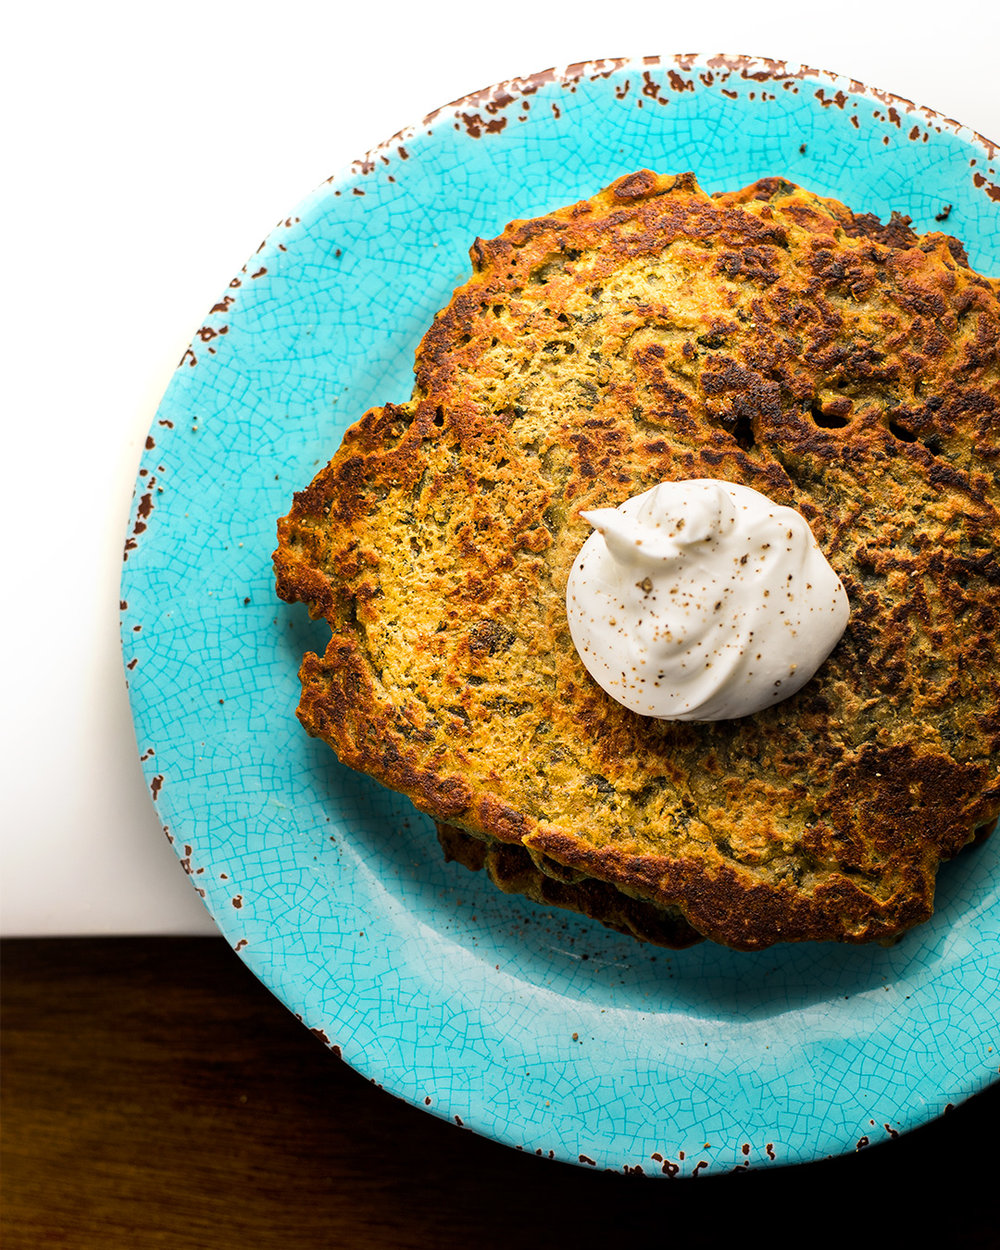 Potato_Spinach_Vegan_Pancakes_Saynomaste_1.jpg